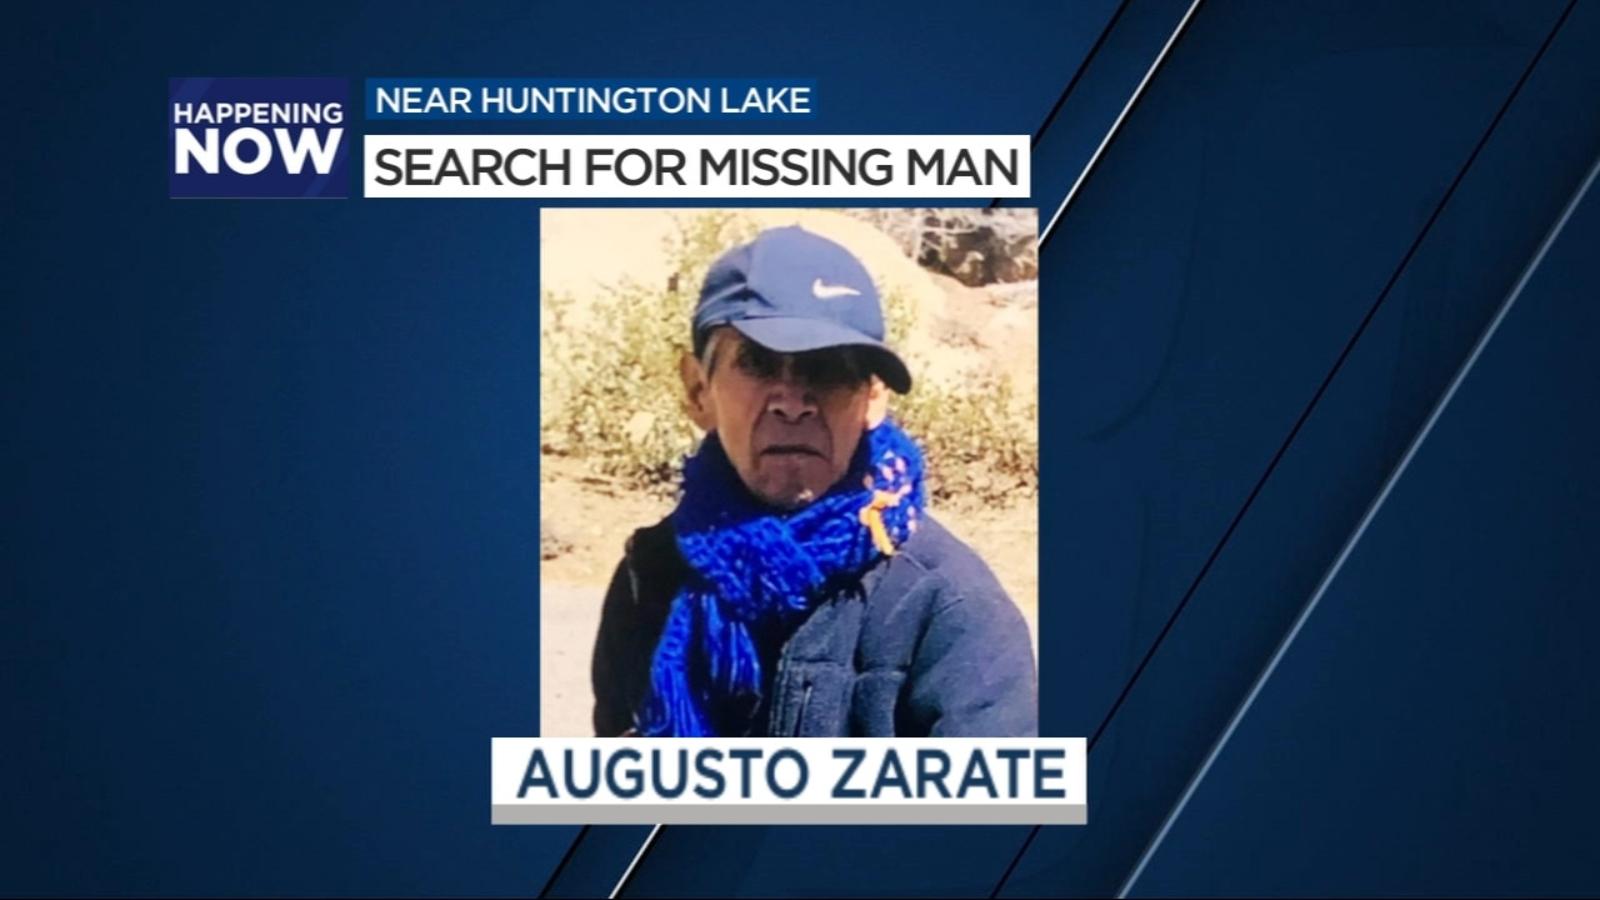 Deputies searching for 85-year-old man missing near Huntington Lake